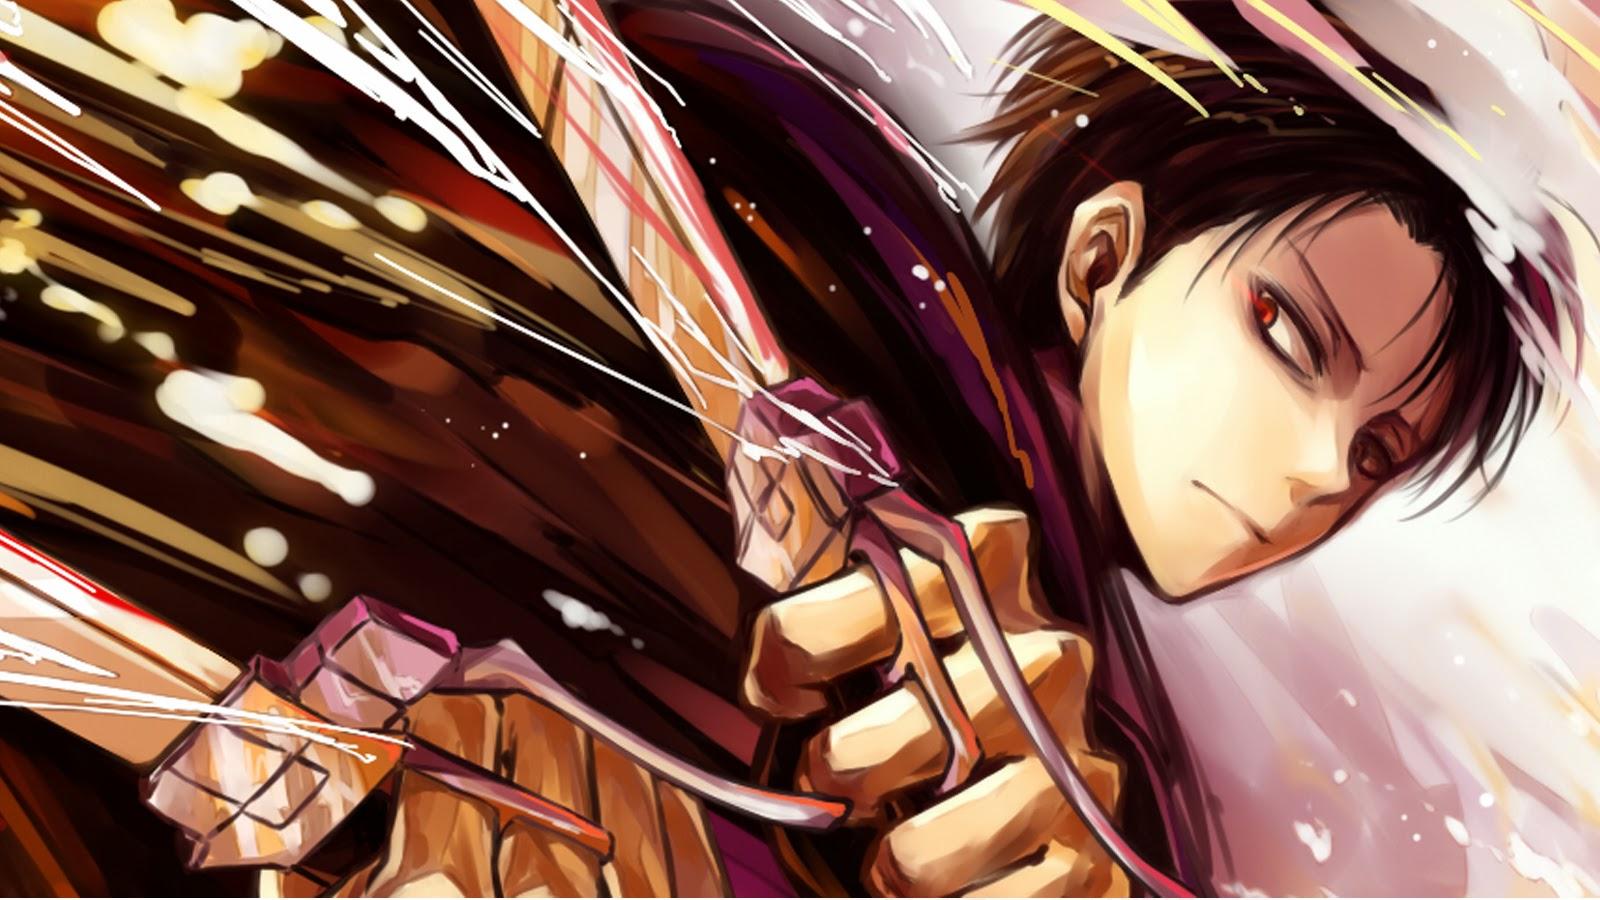 levi anime attack on titan shingeki no kyojin 1600x900 9l 1600x900